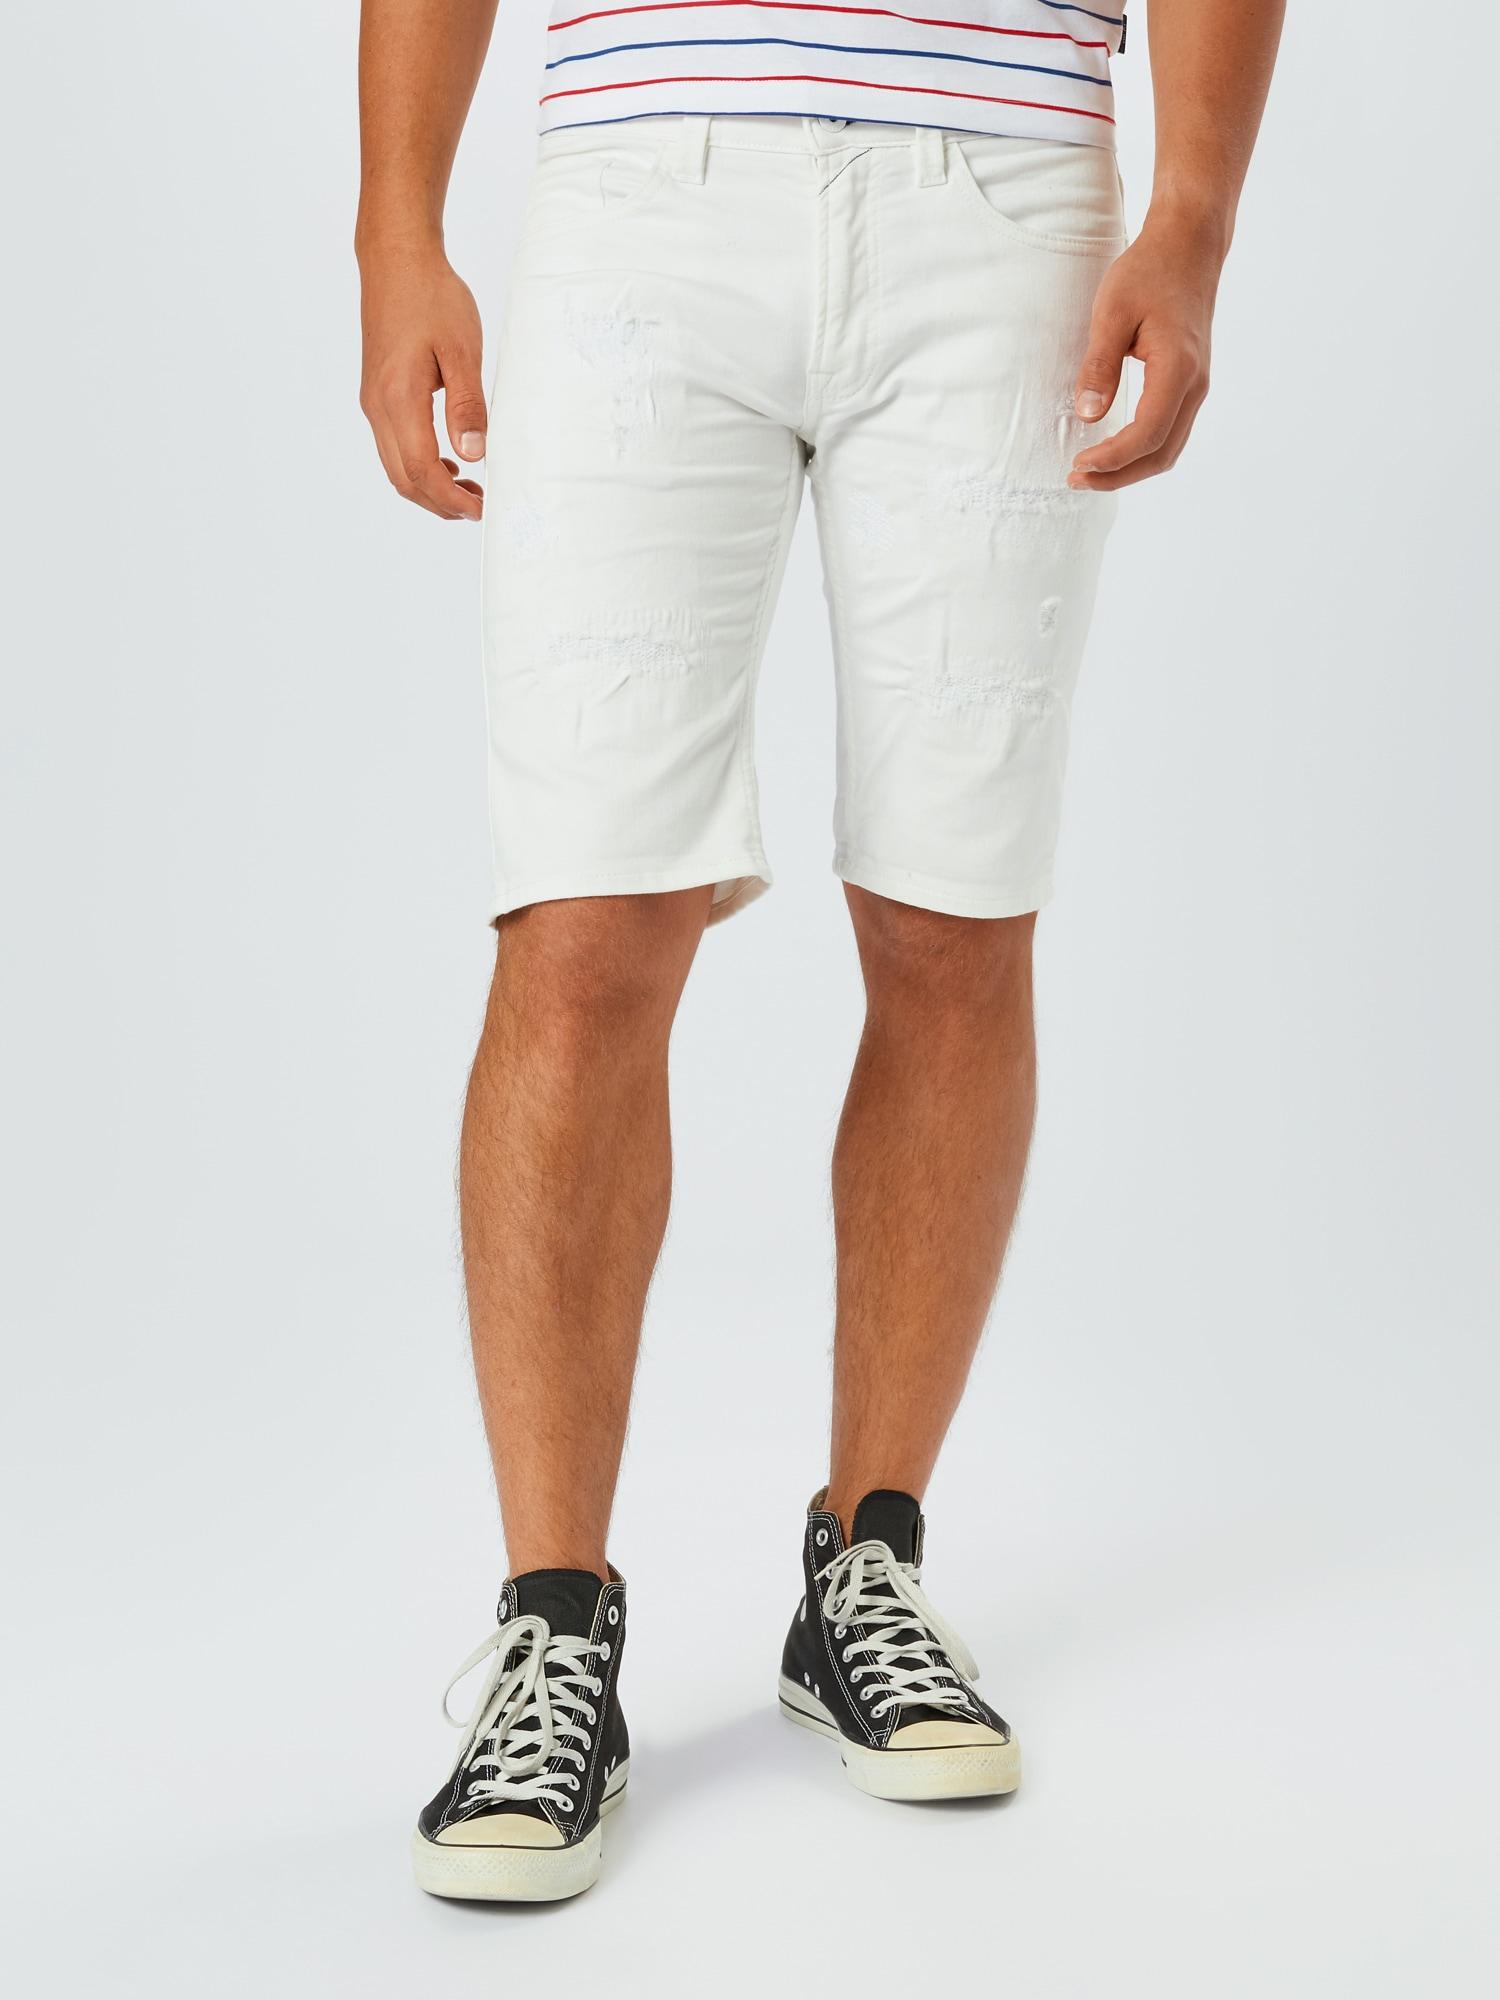 INDICODE JEANS Jeans 'Commecial'  vit